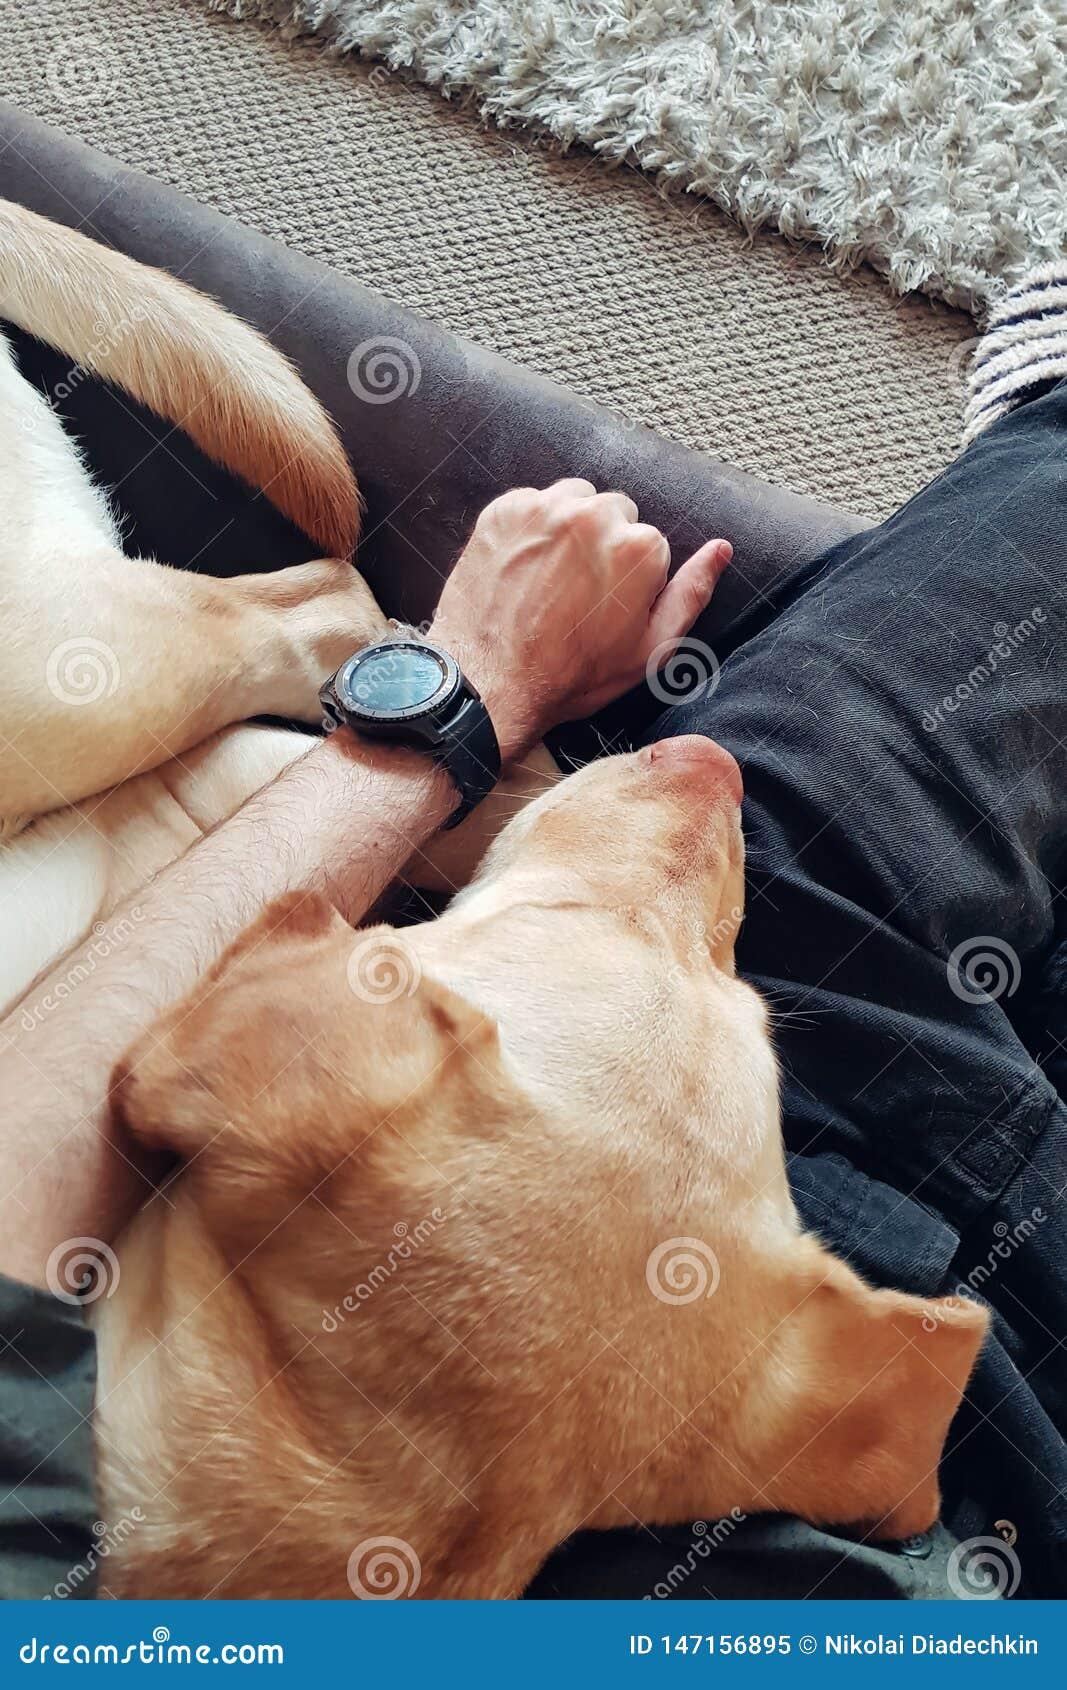 De labrador slaapt op de mens